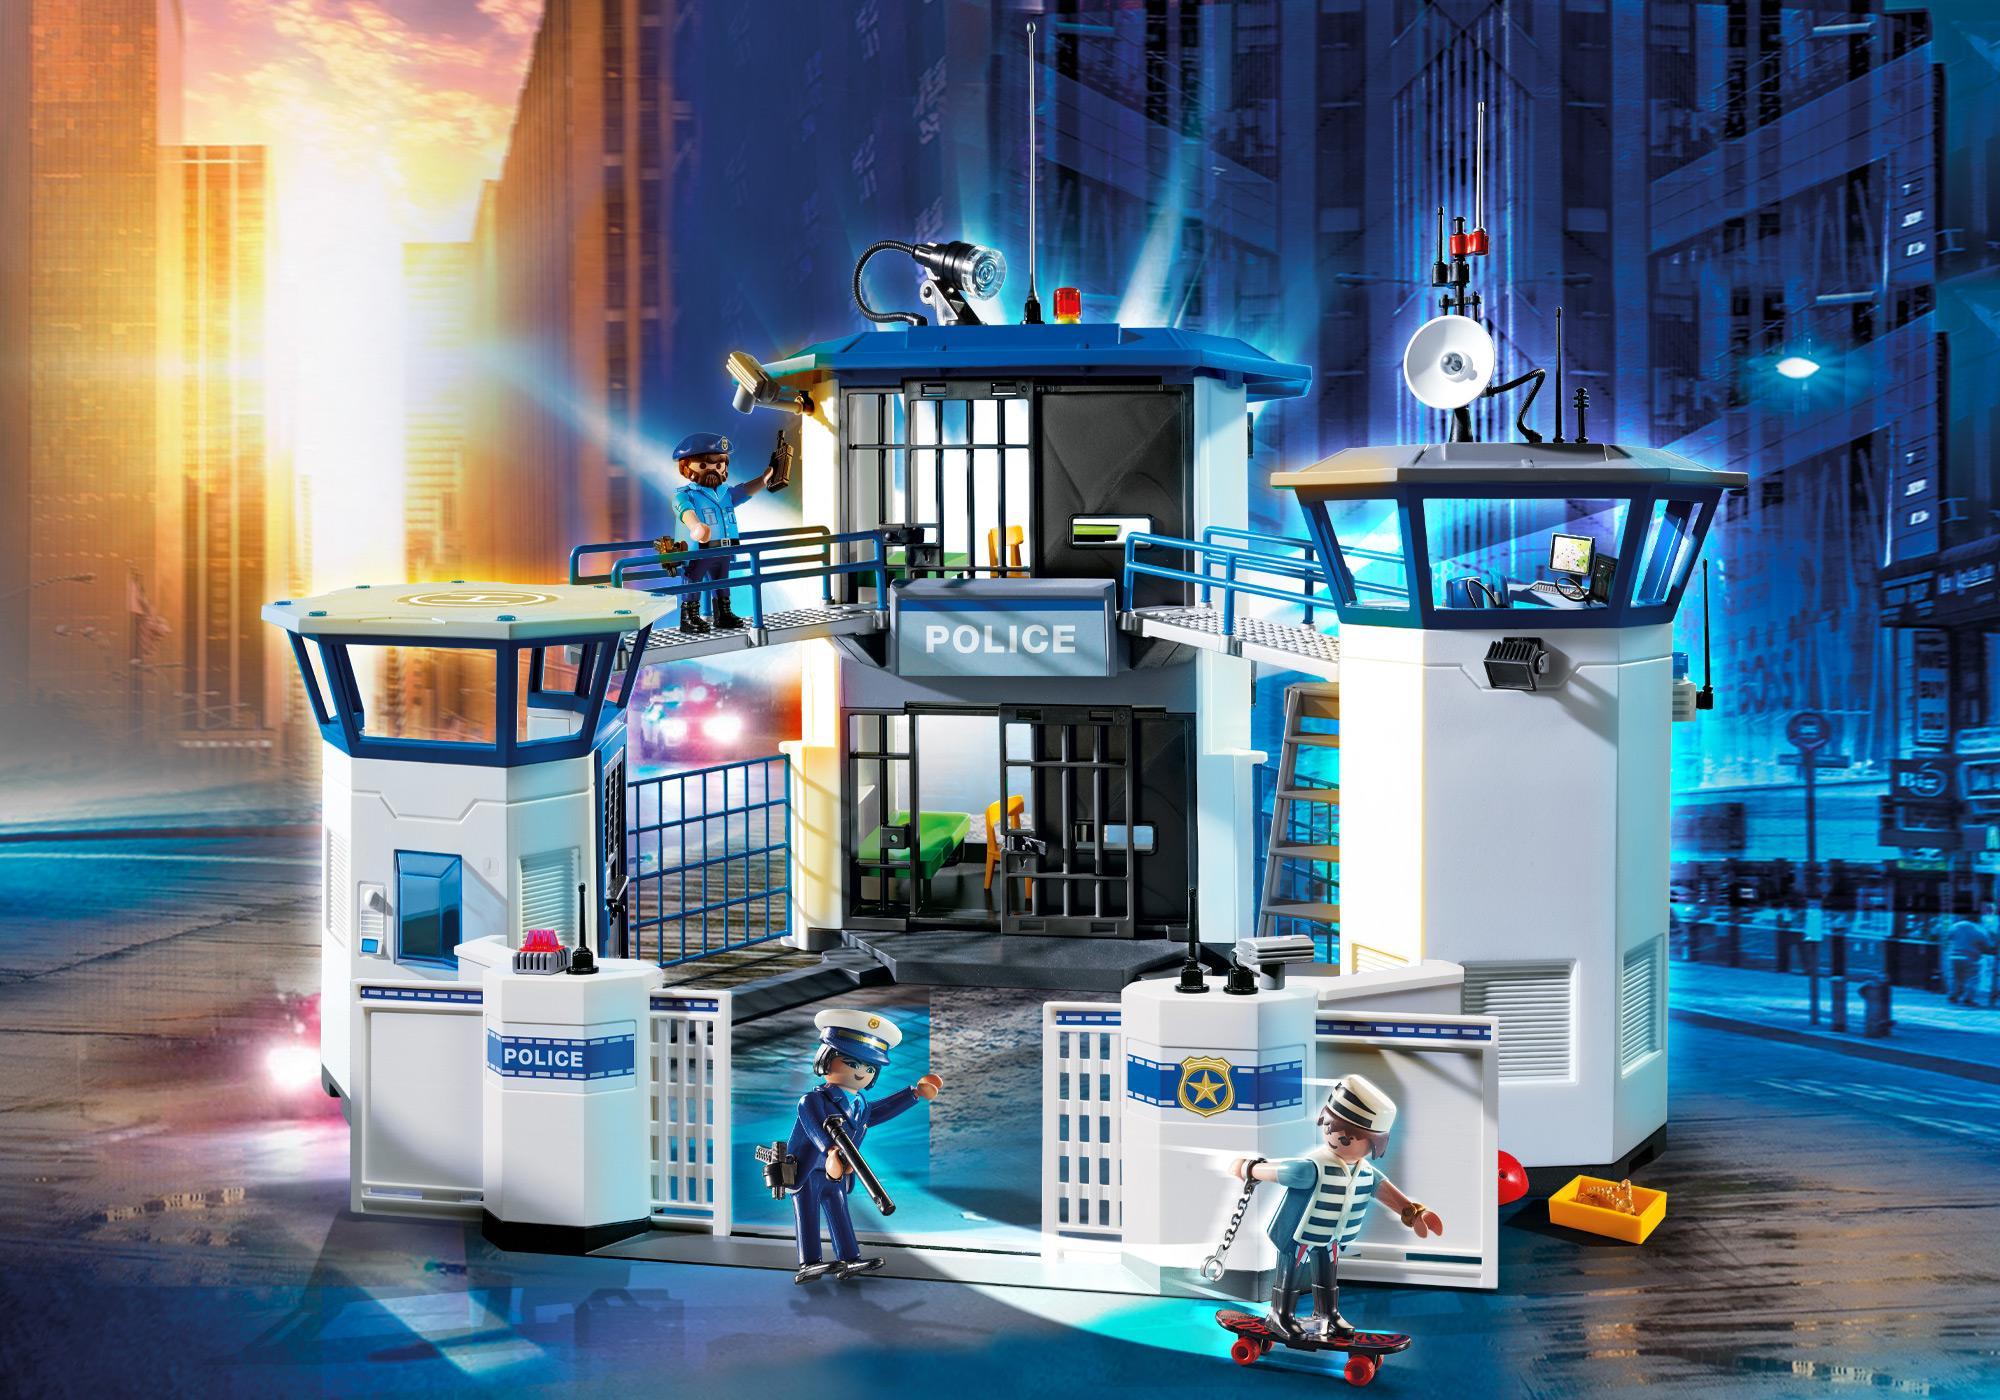 http://media.playmobil.com/i/playmobil/6919_product_detail/Int. Polizei-Kommandozentrale mit Gefängnis